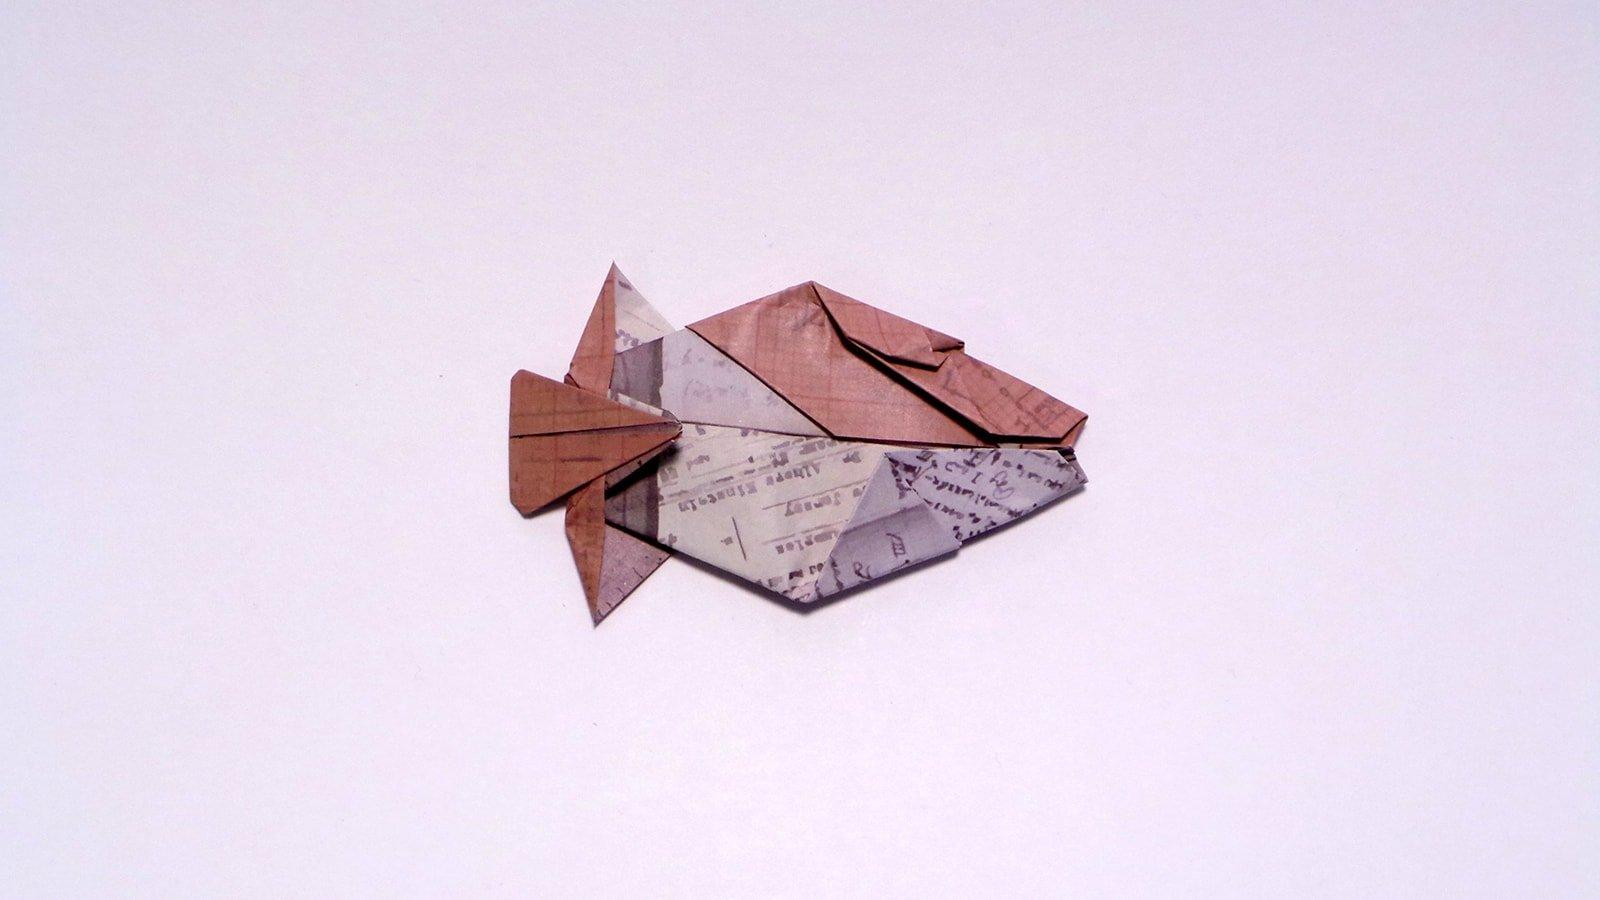 Humuhumunukunukuapua'a folded by Me